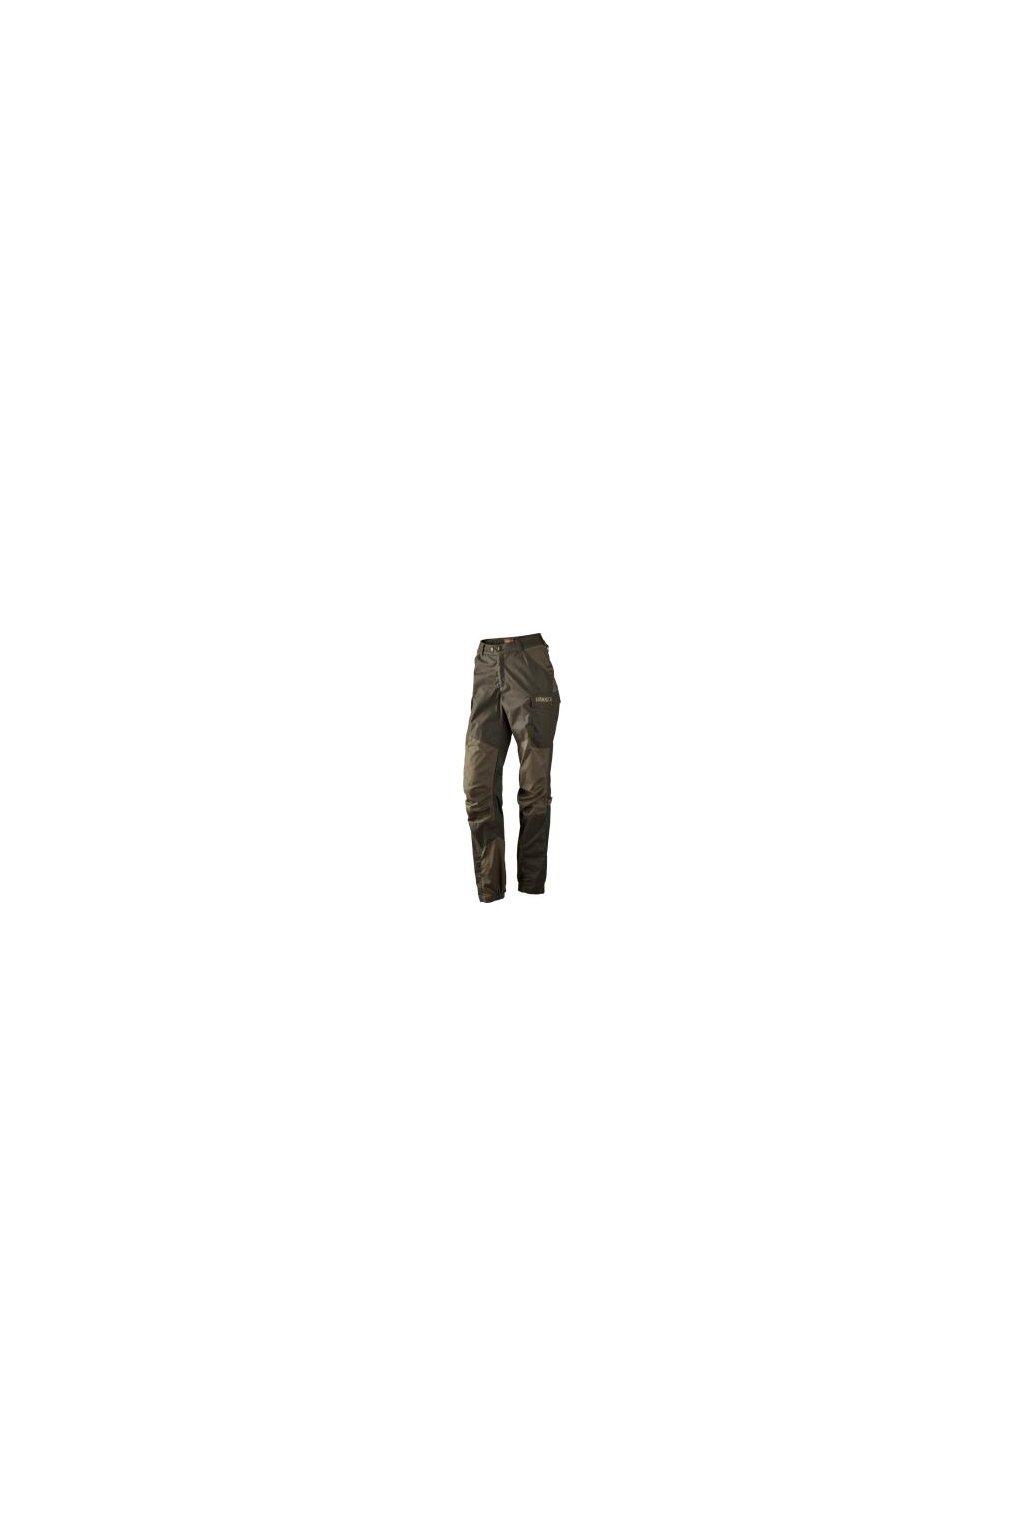 harkila dagny kalhoty duimskun 577e19391c179 m